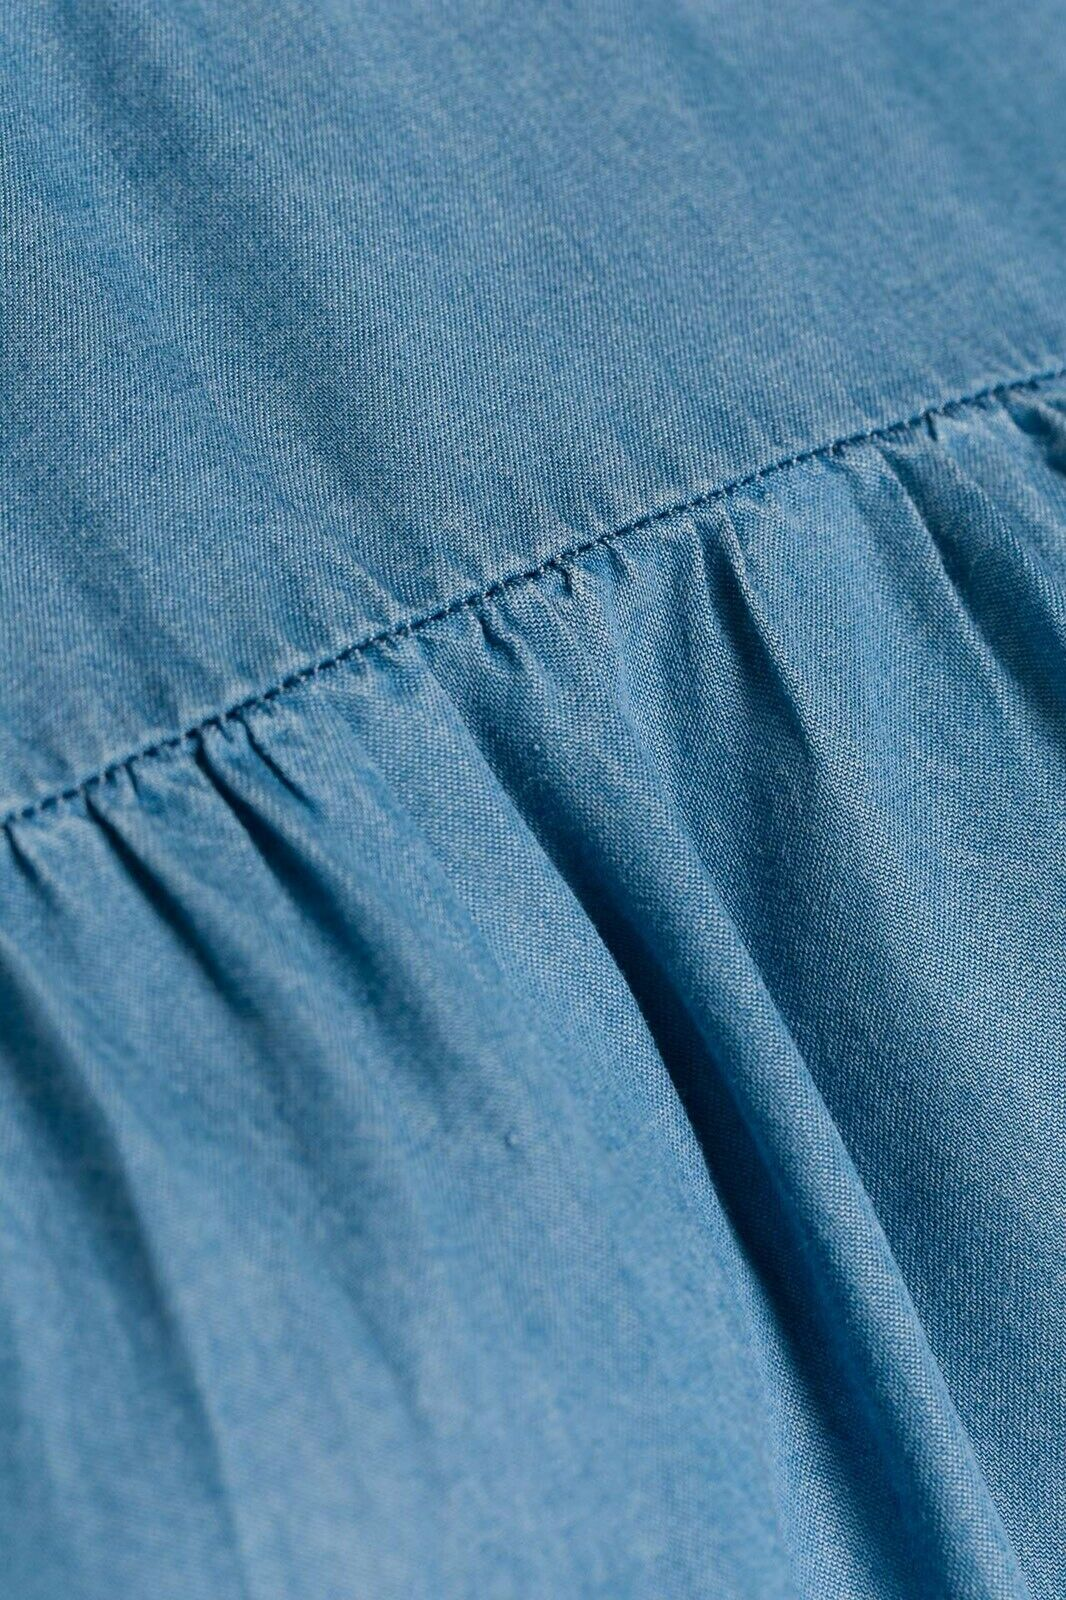 OUI - Cold Shoulder Kleid - Denimoptik - Jeans Blau - Gr. 46 - NEU mit Etikett